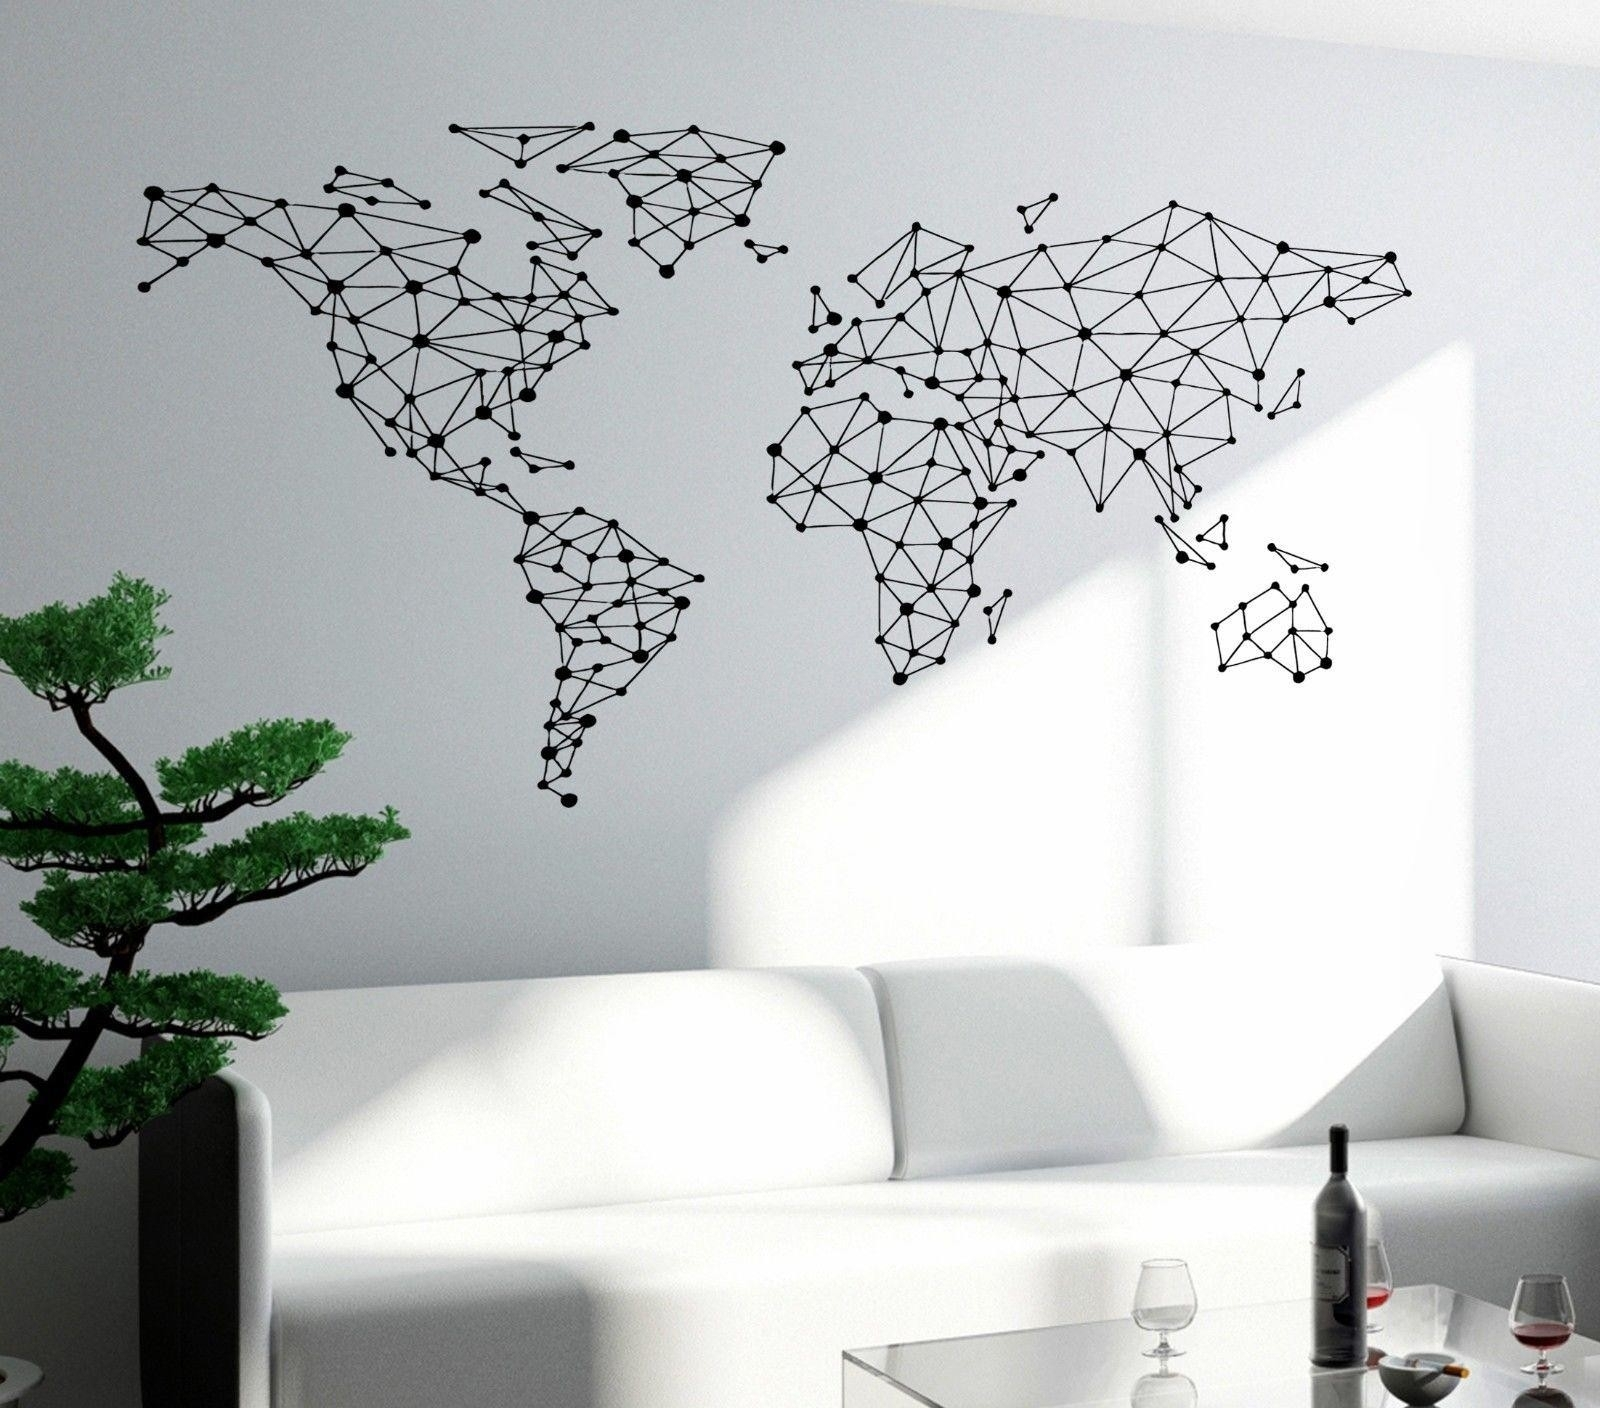 World Map Wall Art – World Maps Collection Regarding Newest Maps Wall Art (View 16 of 20)